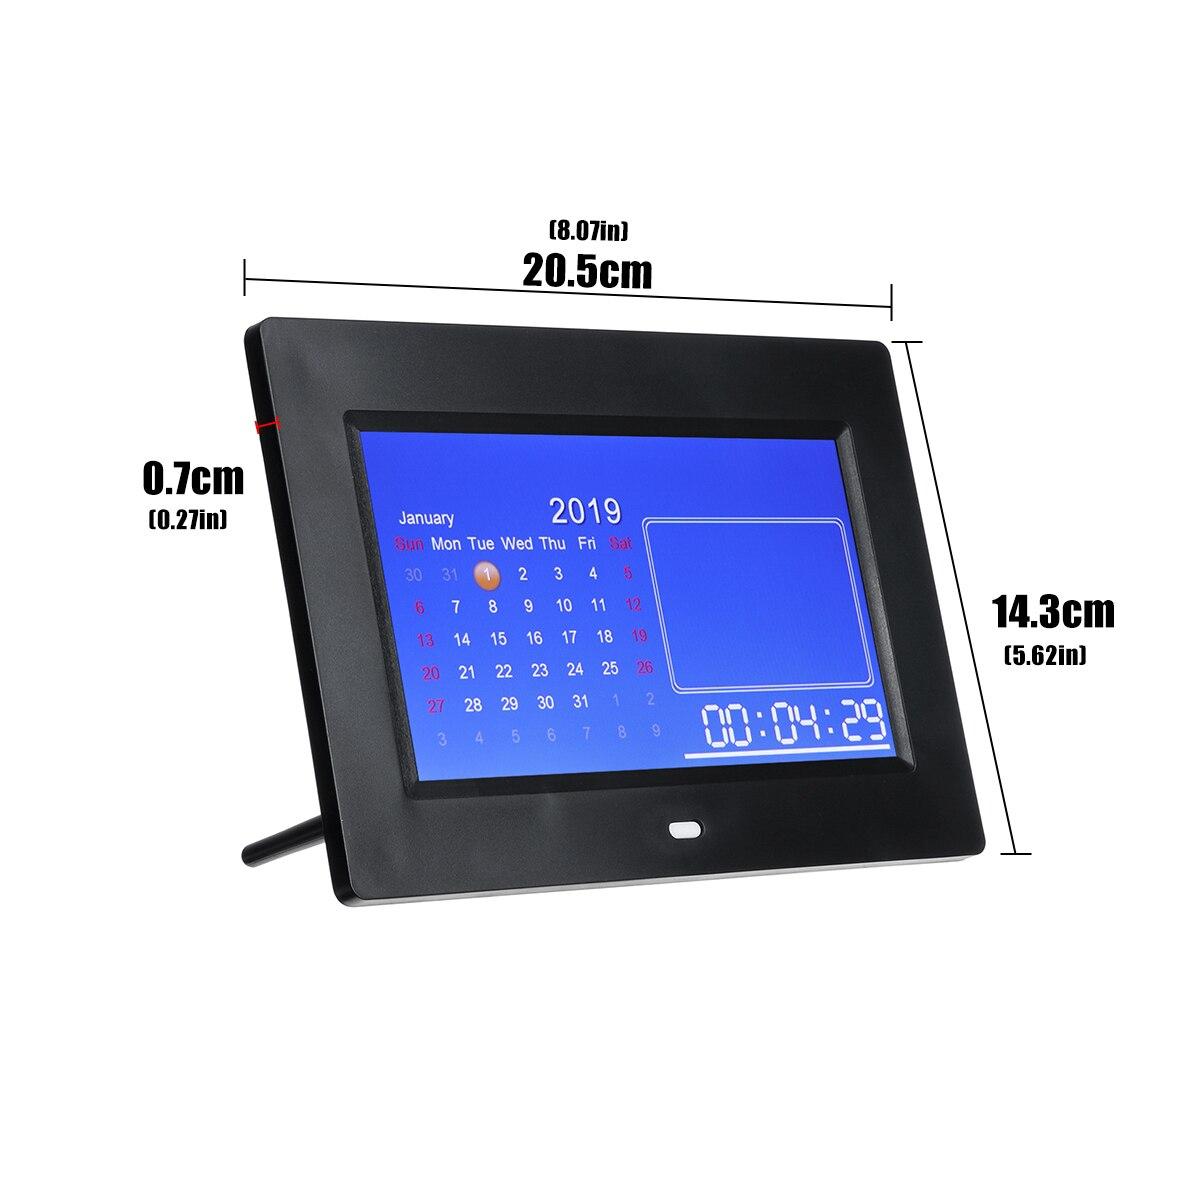 7inch HD LED Digital Photo Frame Electronic Album Calendar Timing Alarm Clock Video MP3 Playing USB 8 Languages Setting 1024*600 enlarge